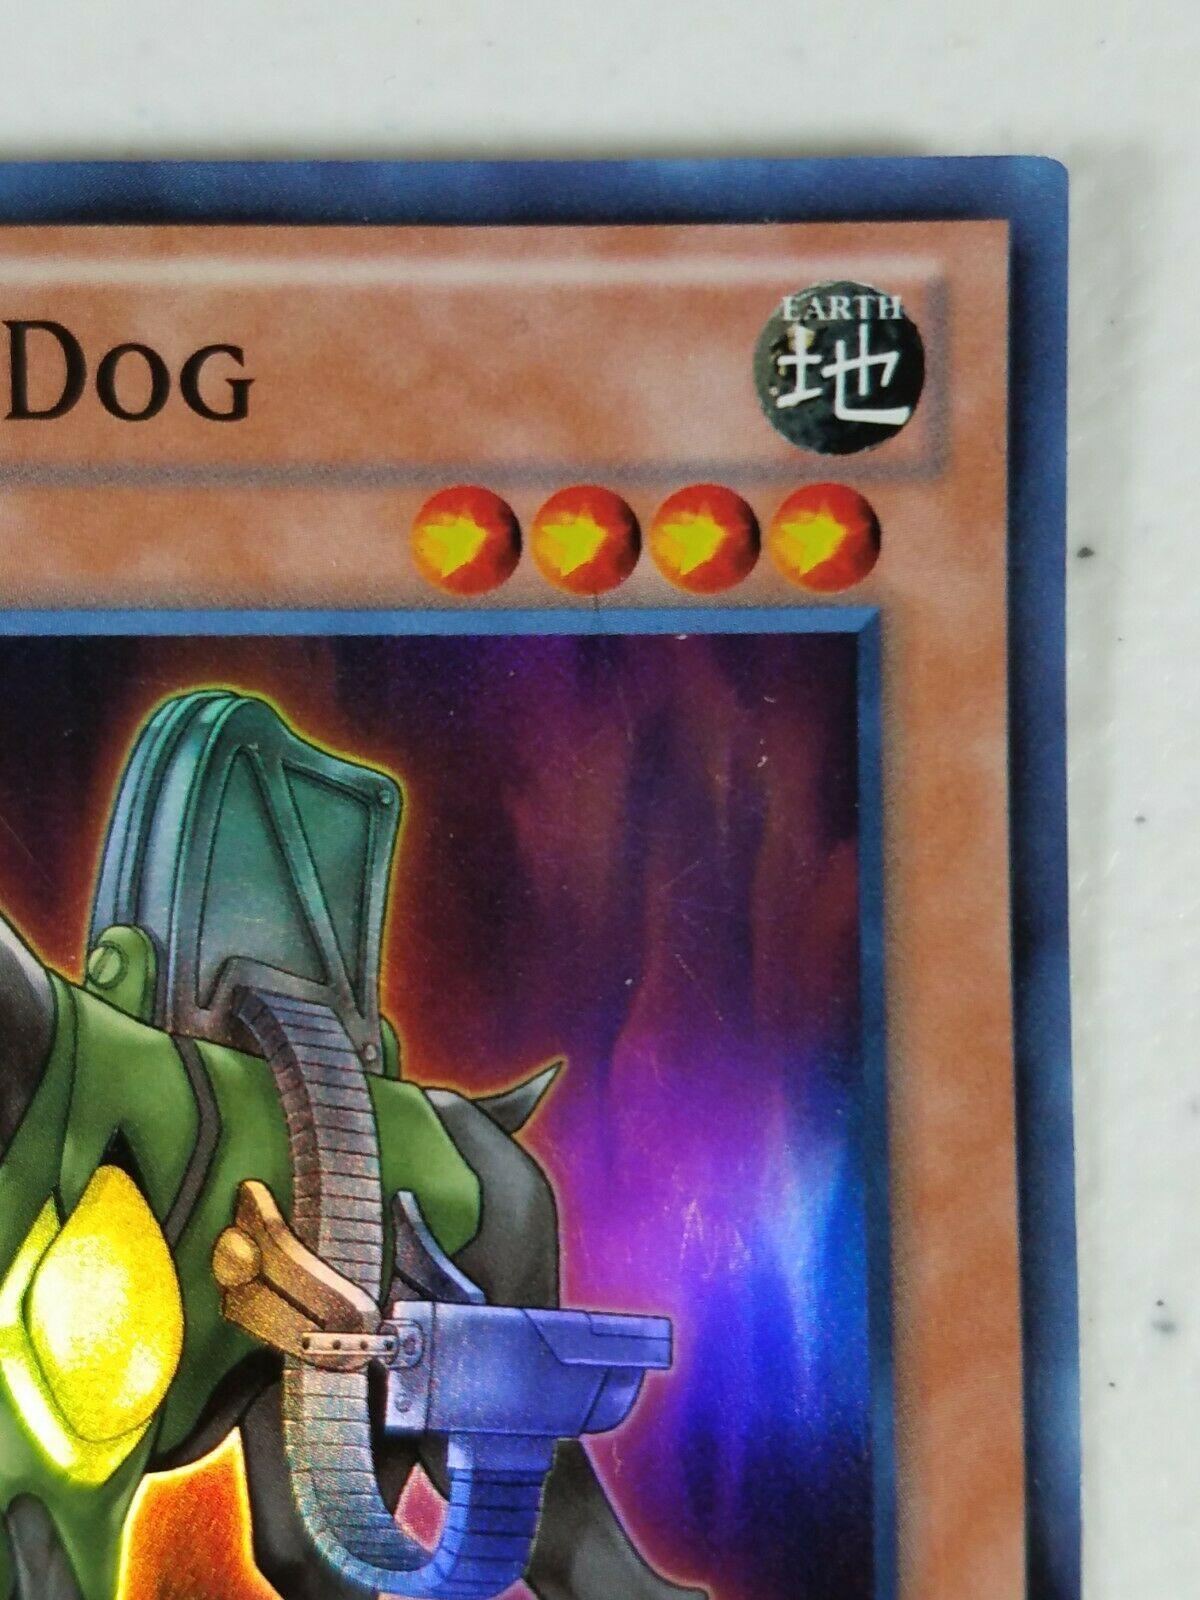 Yu-gi-oh! Trading Card - Assault Dog - DRLG-EN033 - Super Rare - 1st Ed.